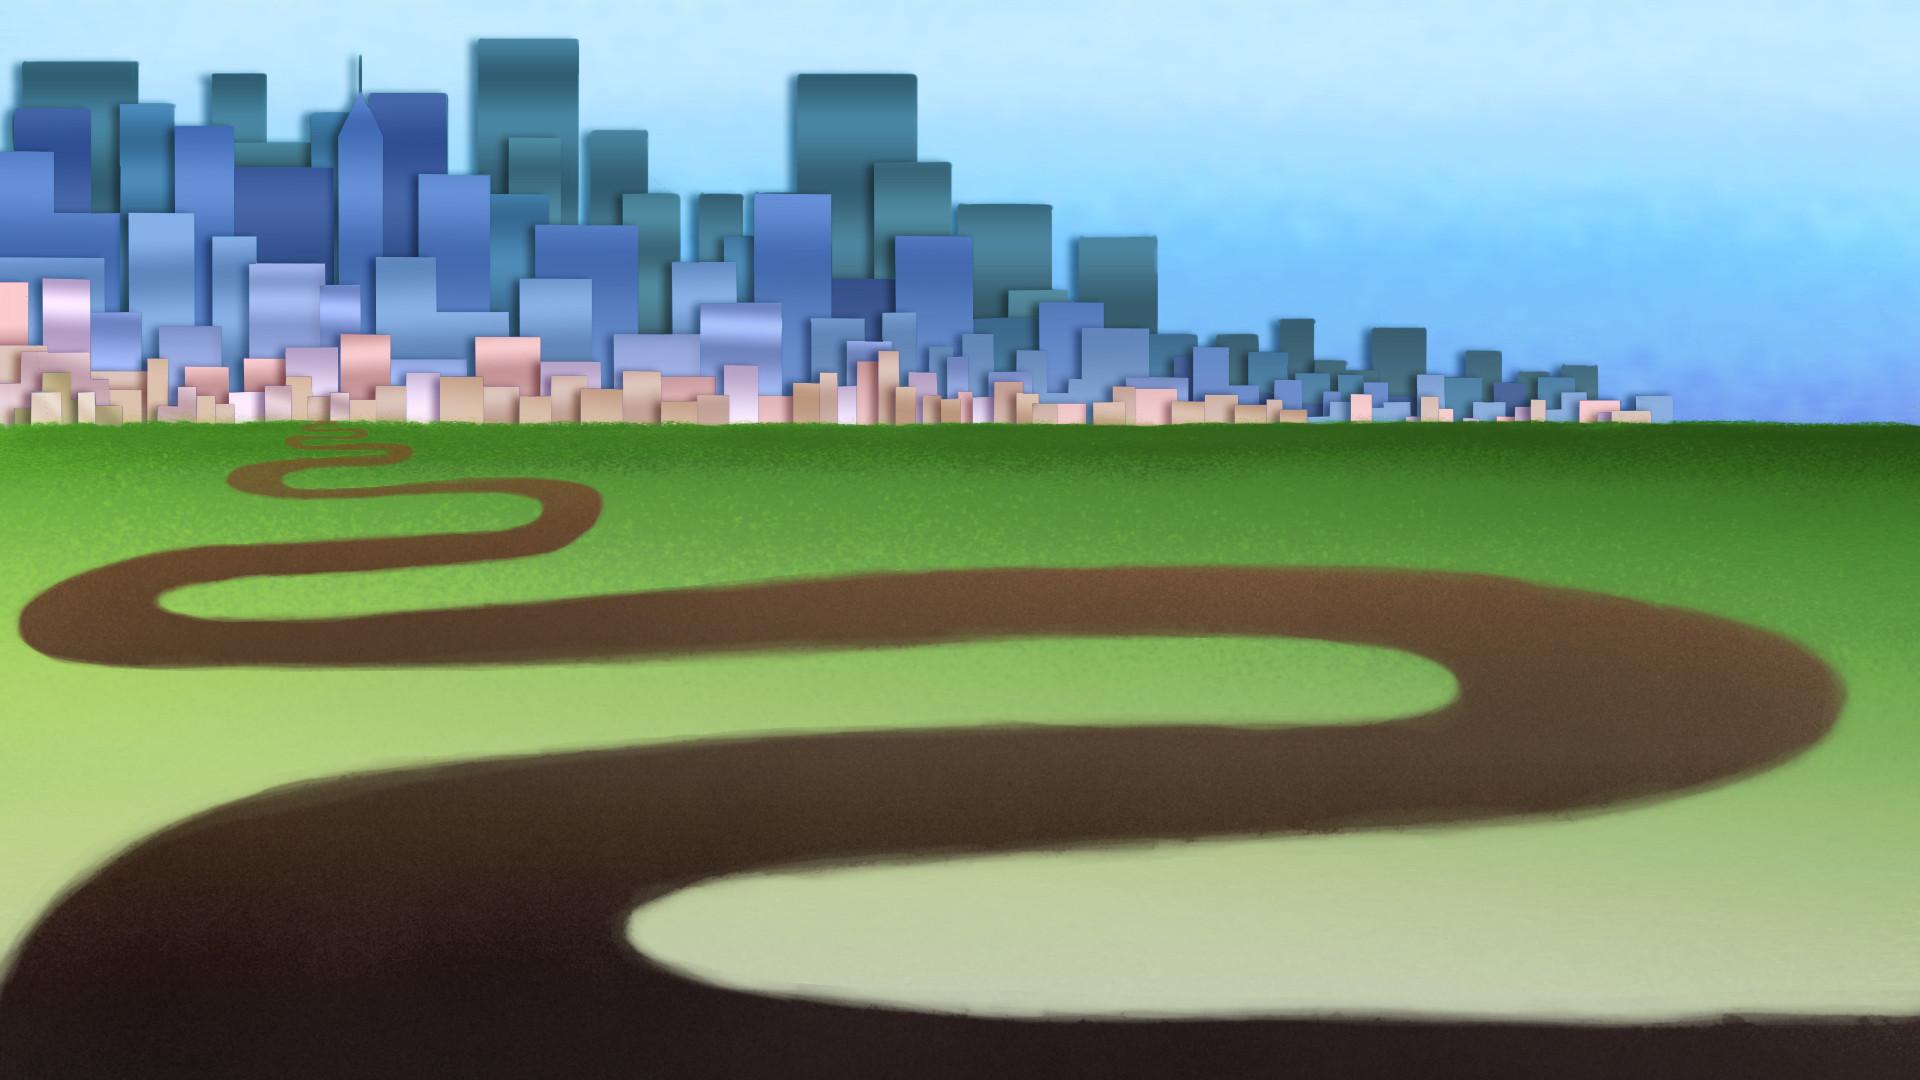 Final background